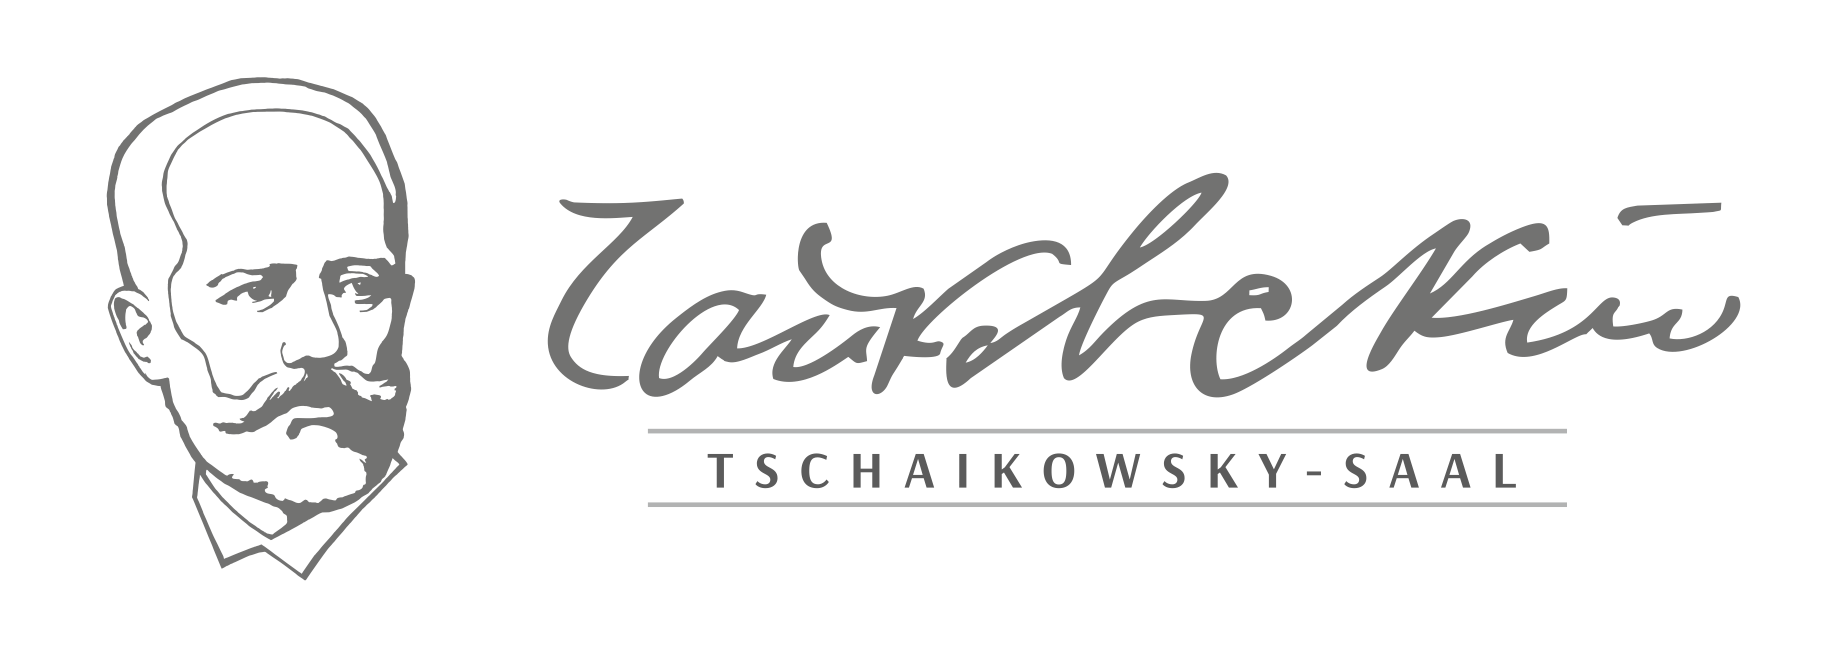 Зал Чайковского в Гамбурге